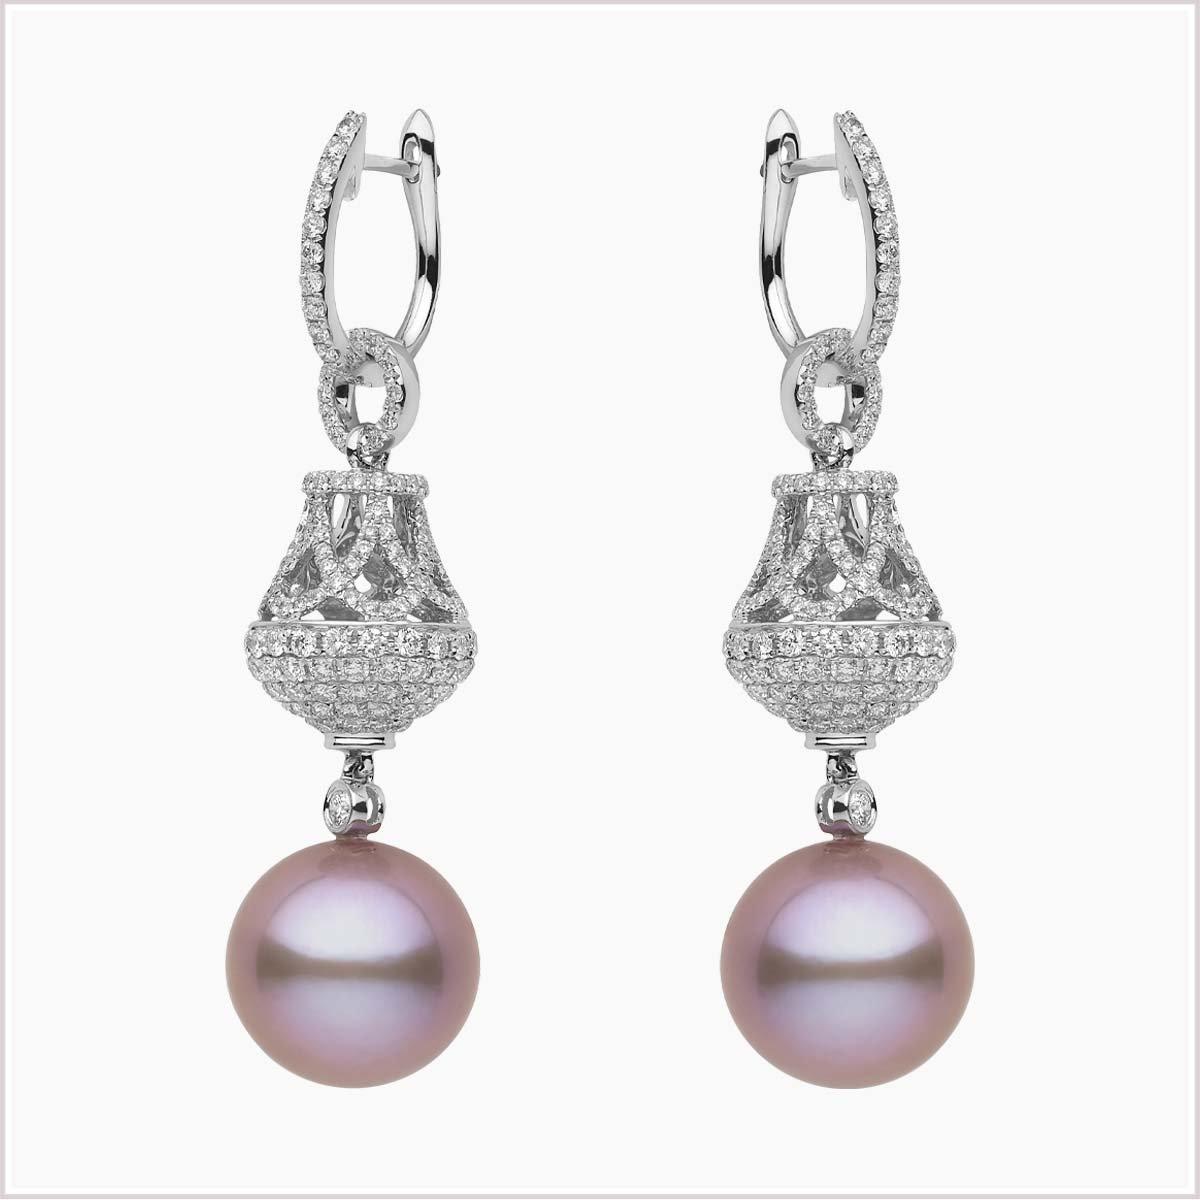 Yoko Radiant Orchid Diamond and Pink Freshwater Pearl Earrings